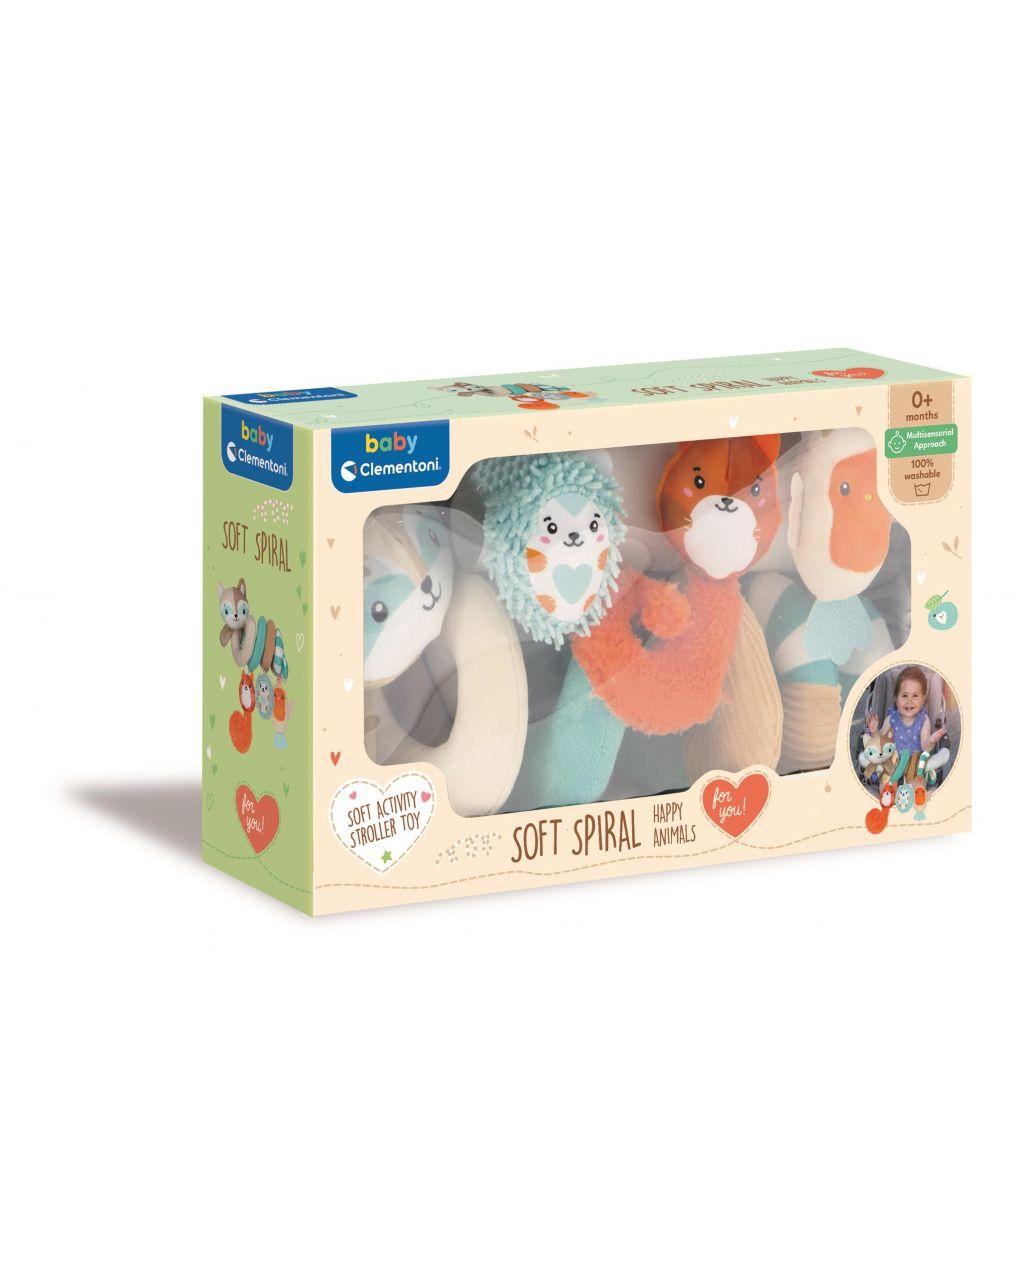 Baby clementoni - soft spiral happy animals - Clementoni